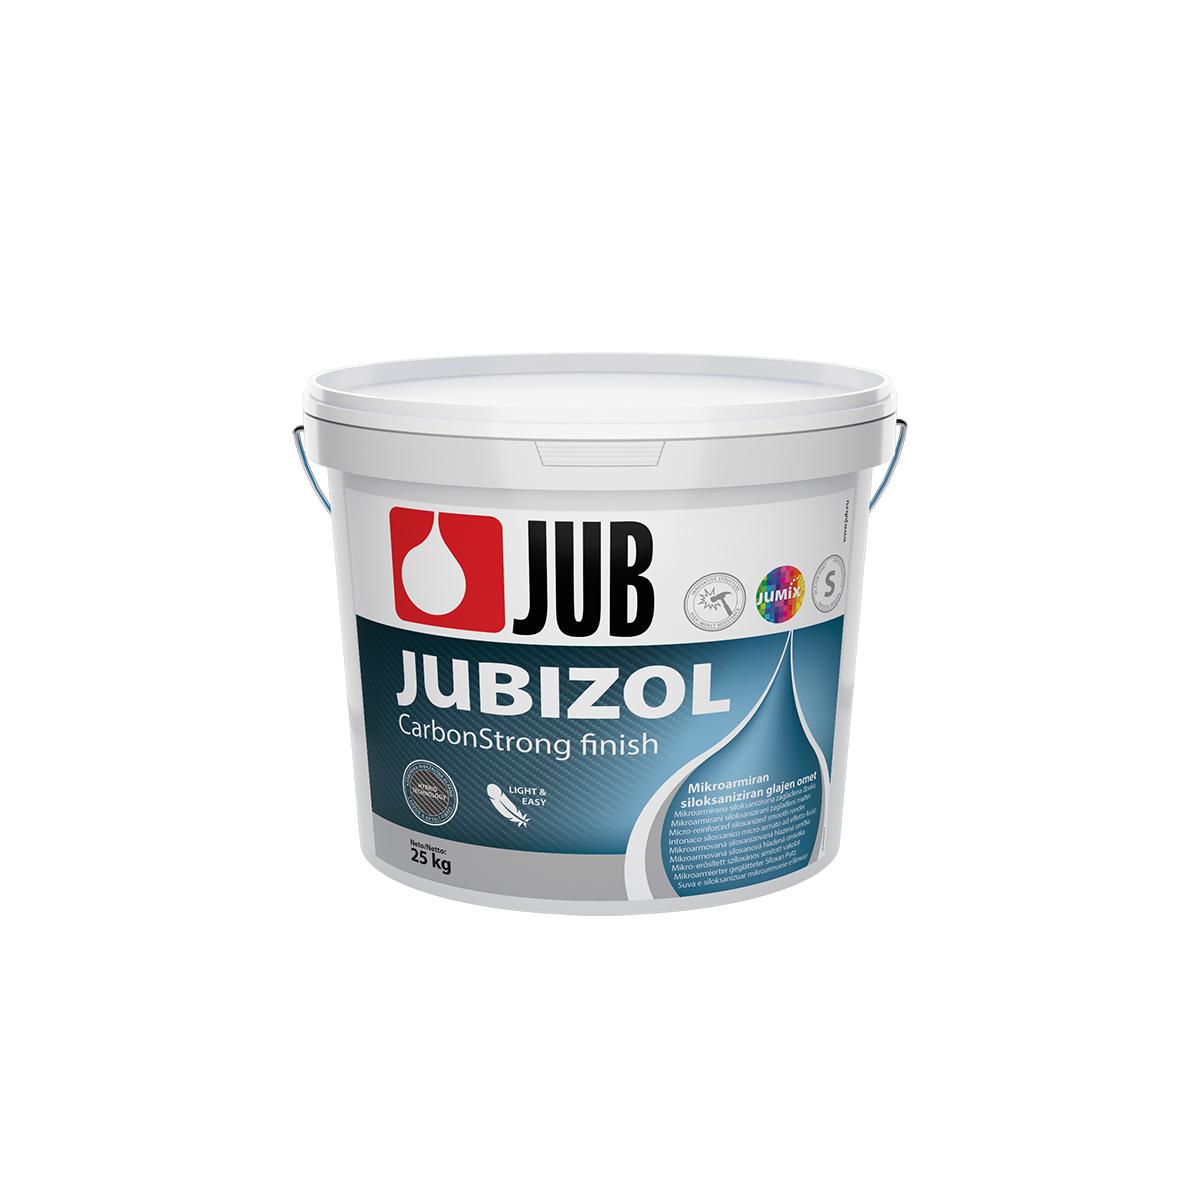 JUBIZOL CARBON STRONG FINISH SEP20 25KG